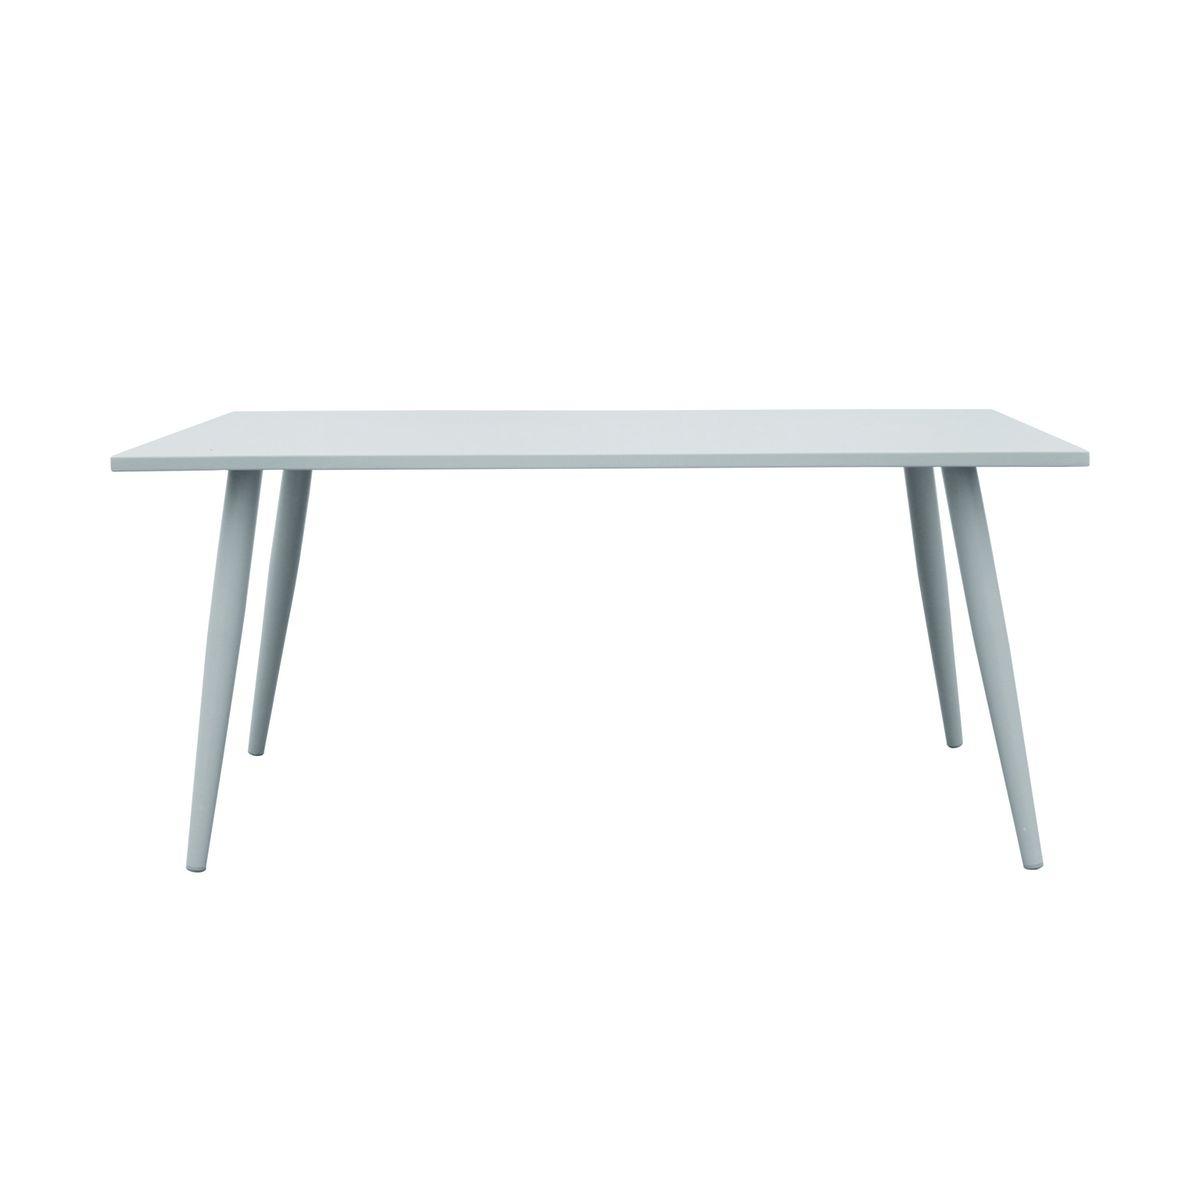 Outlet tavoli e sedie milano sedie e tavoli aeffe with for Leroy merlin tavoli e sedie da cucina